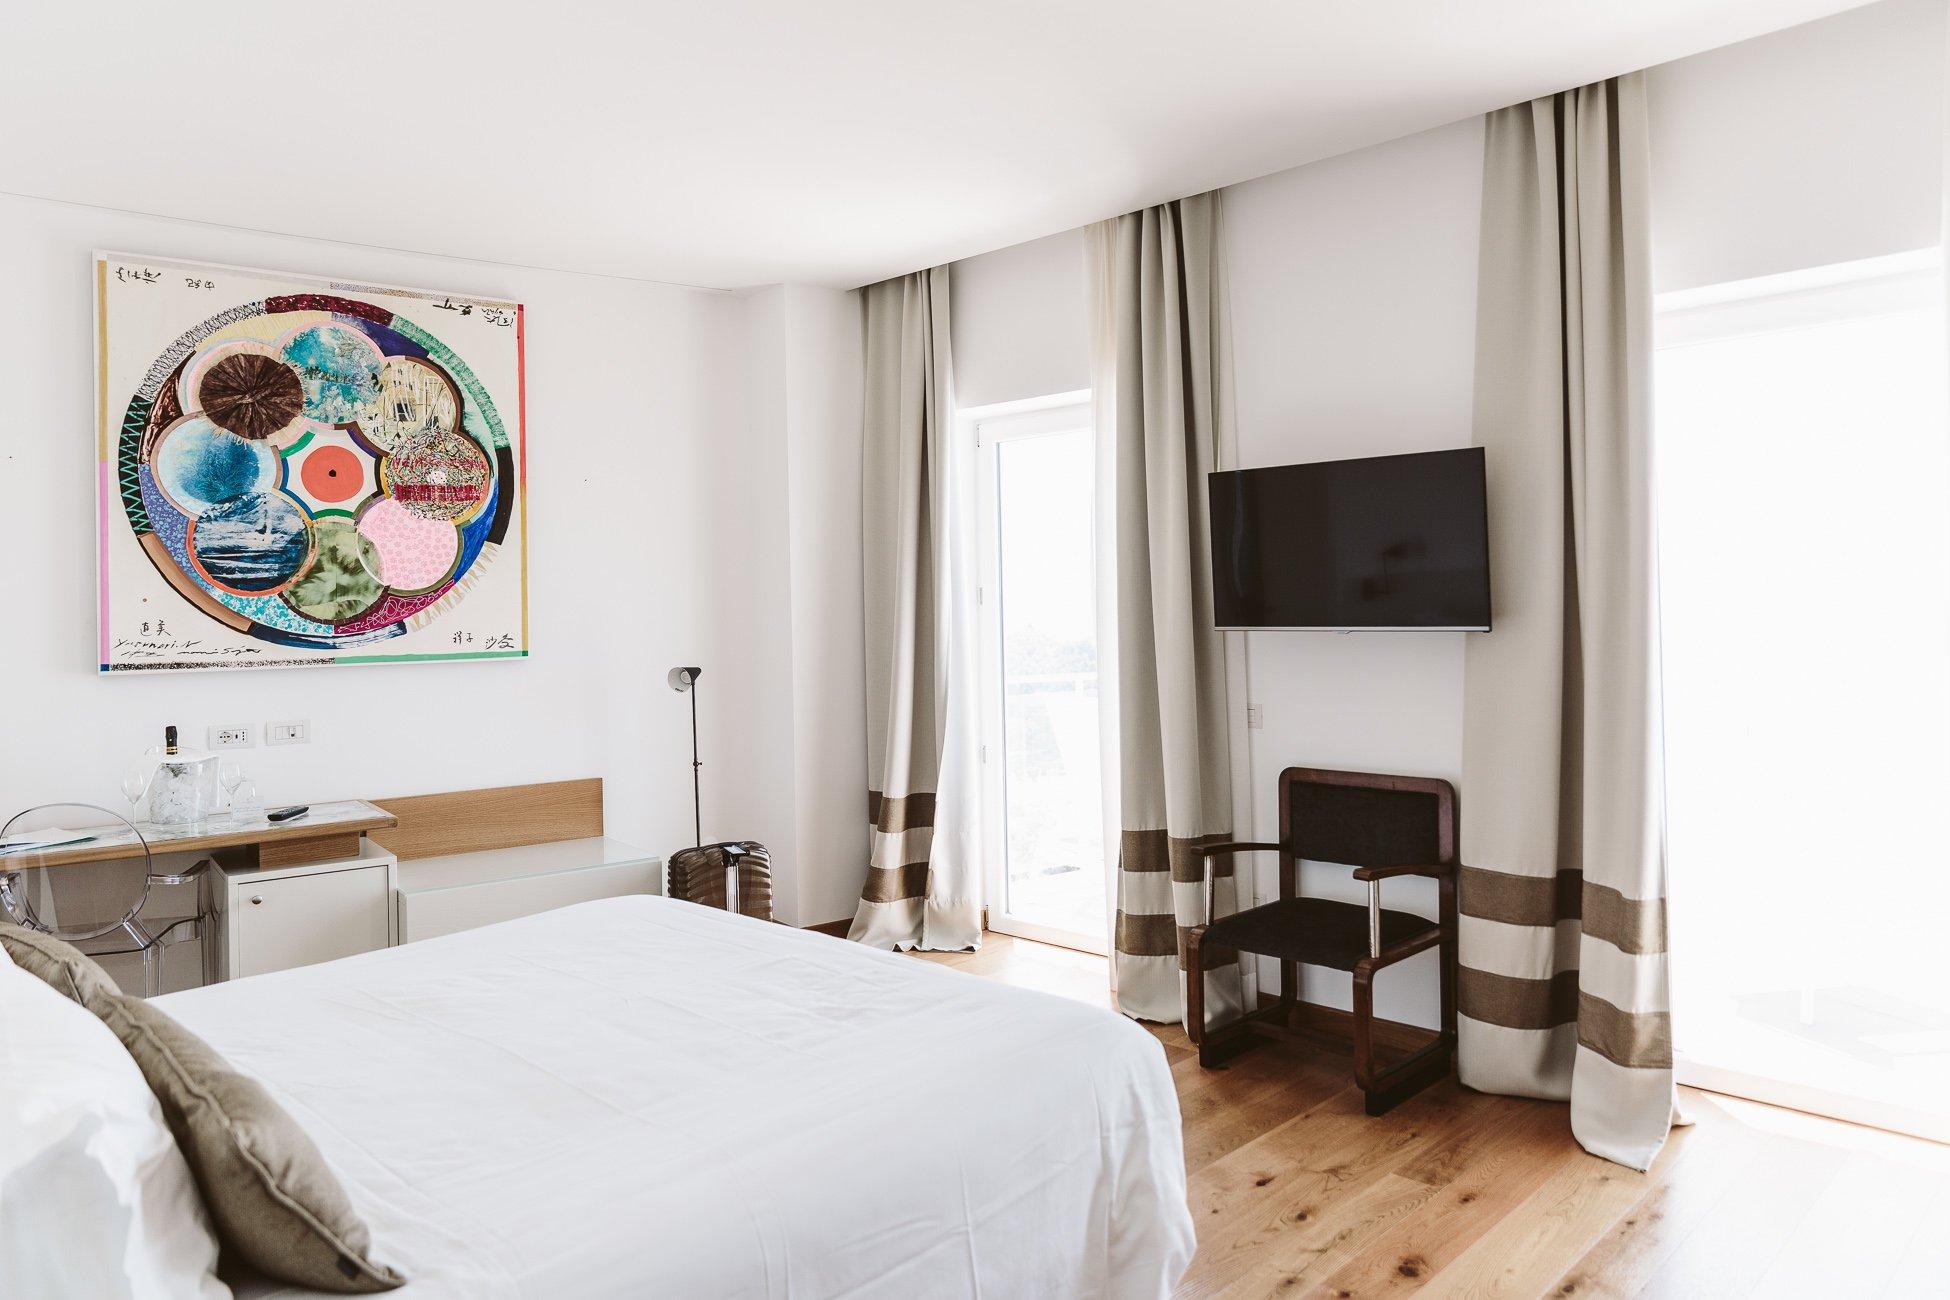 Junior Suite at Art Hotel Villa Fiorella in Massa Lubrense